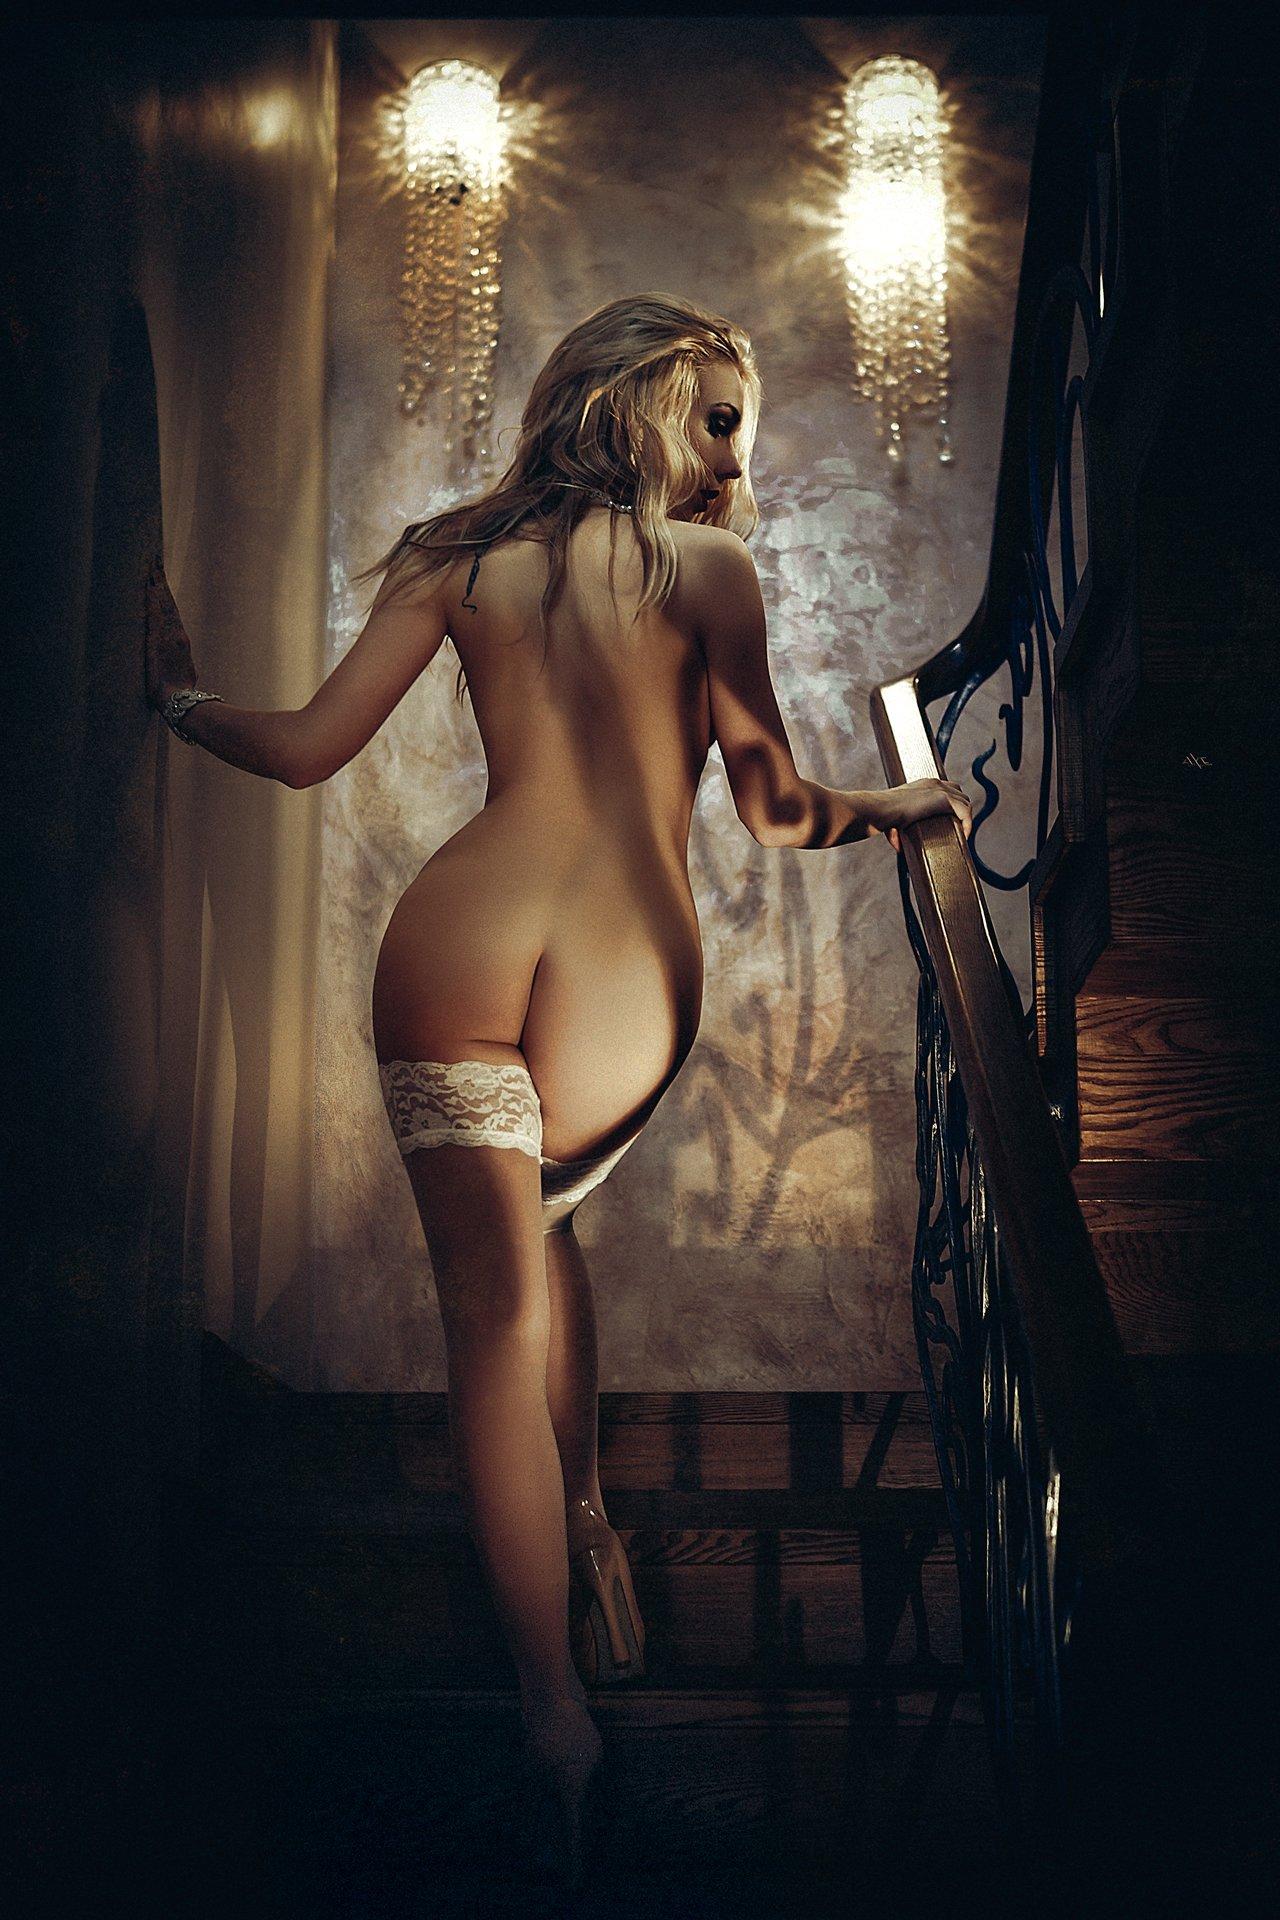 woman, nude, stairs, light, beauty, Руслан Болгов (Axe)